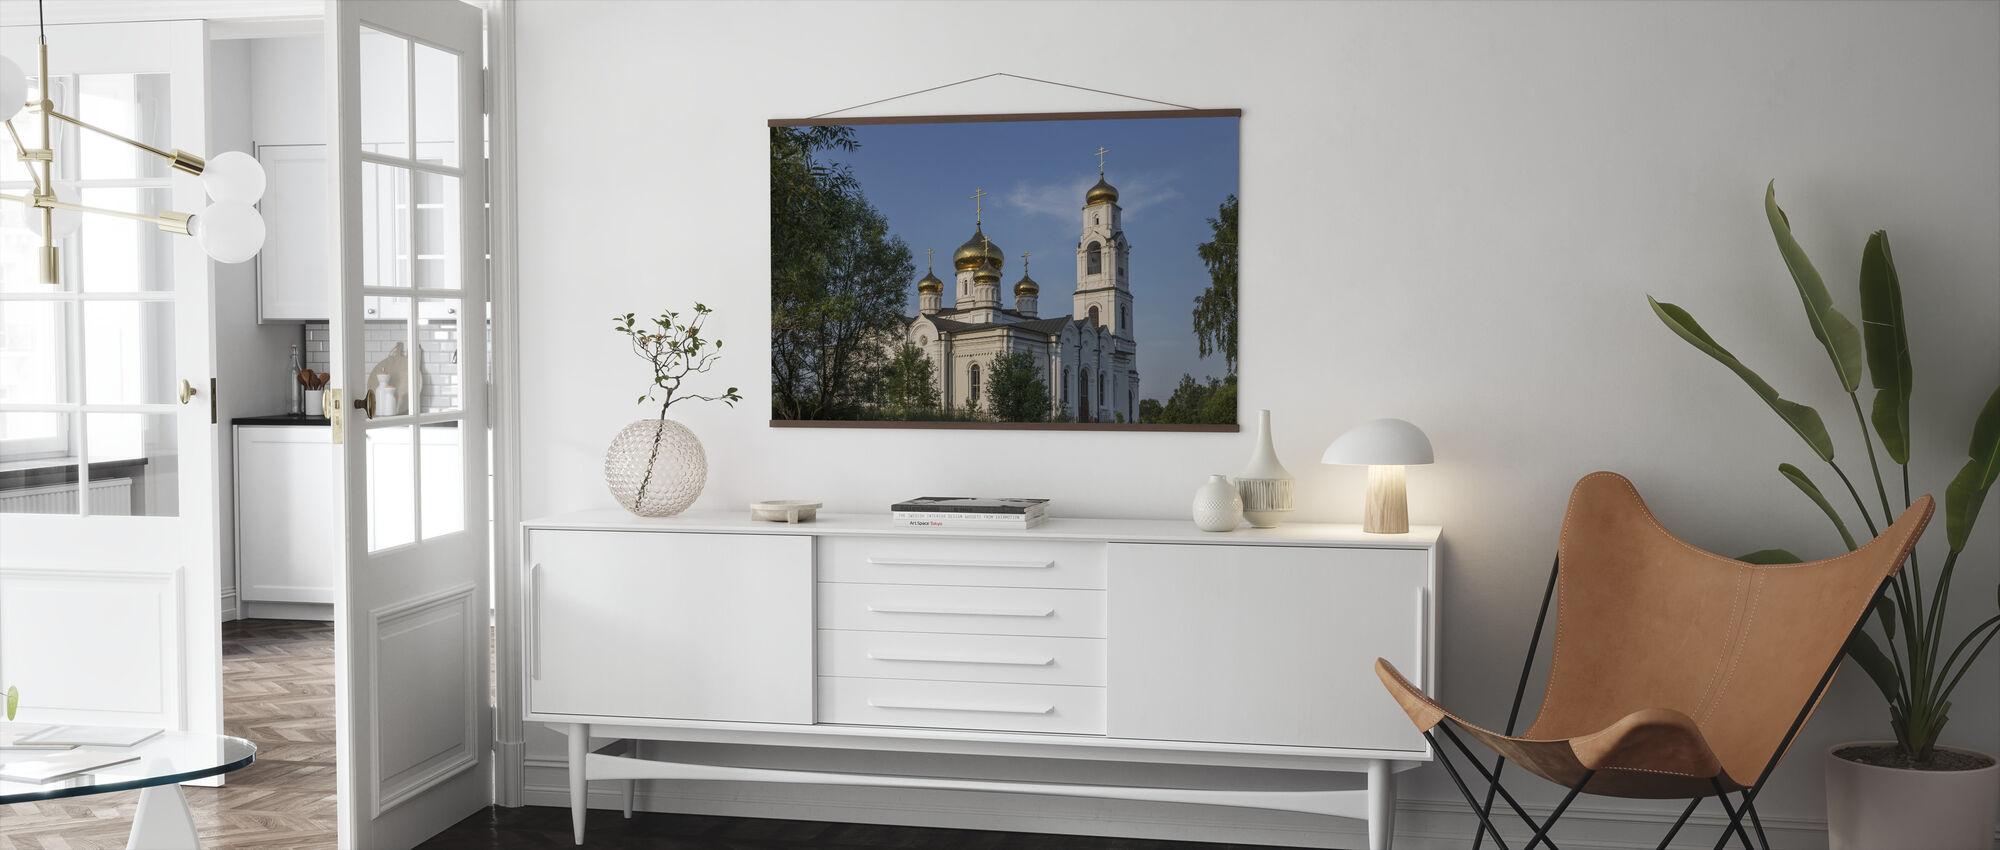 Church of Saint Nicholas, Moscow - Poster - Living Room